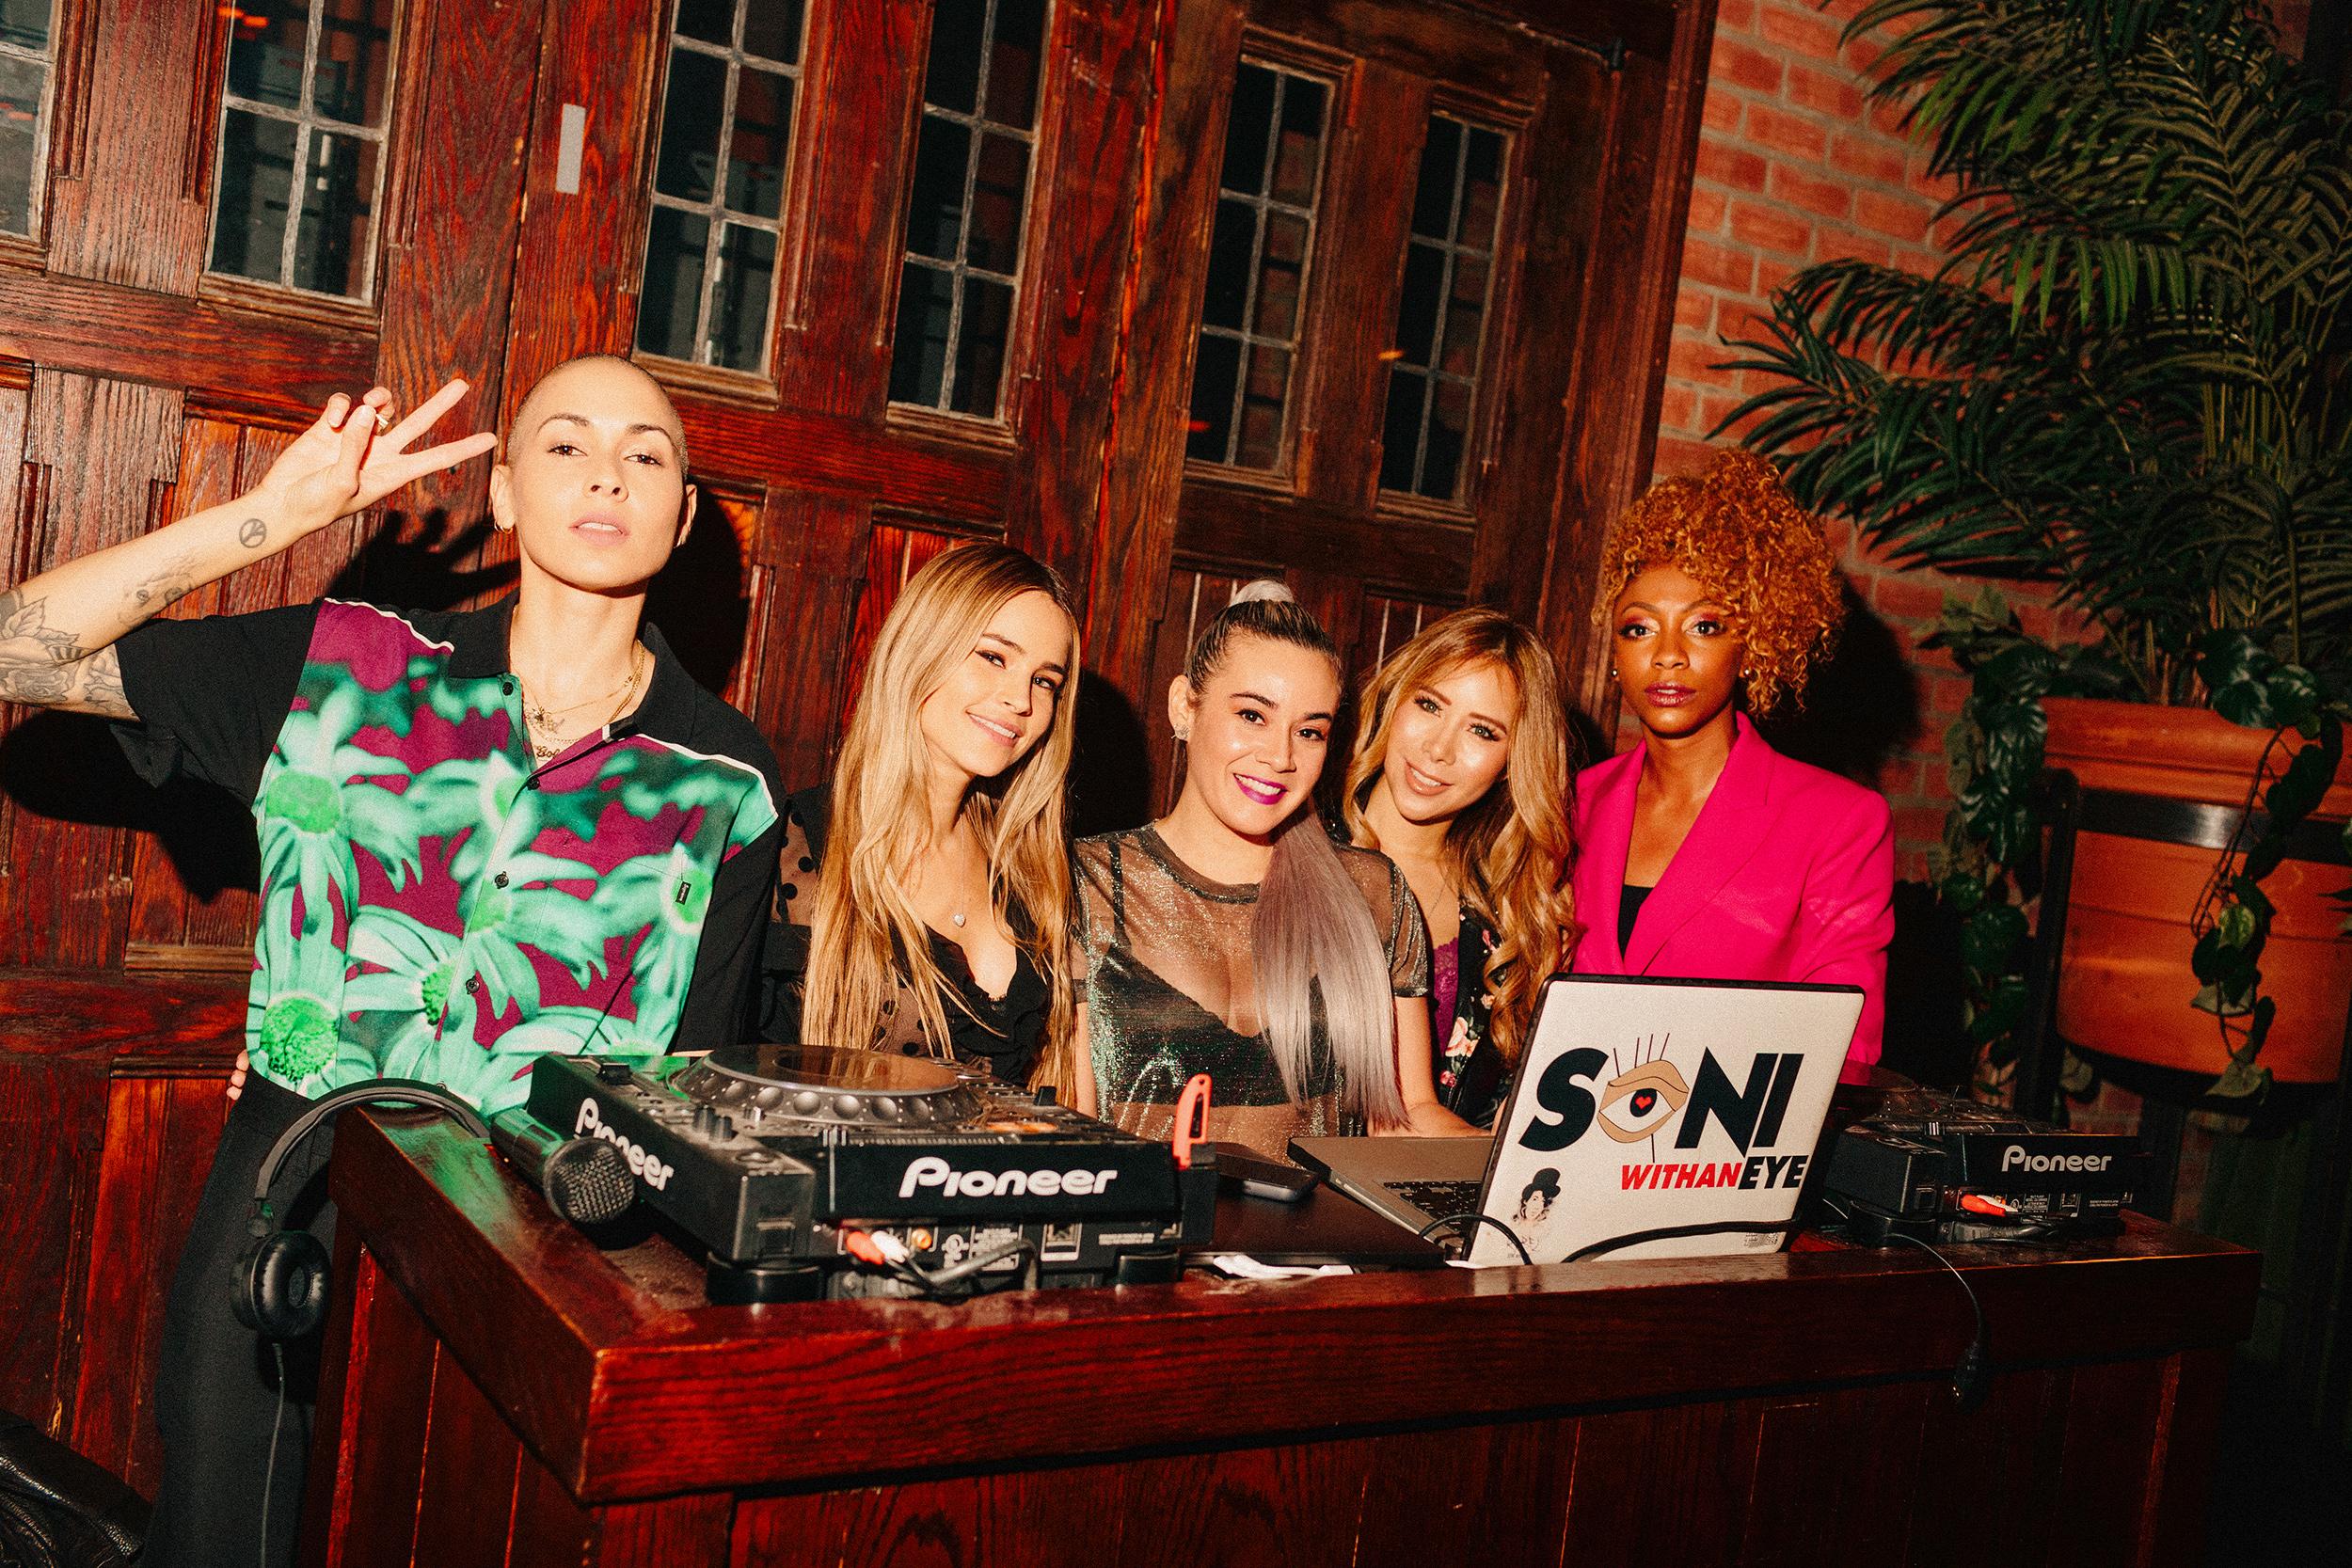 Nicole Albino, Layla Benitez, SONI withanEYE, DJ Sophia Lin, & DJ C. DeVone